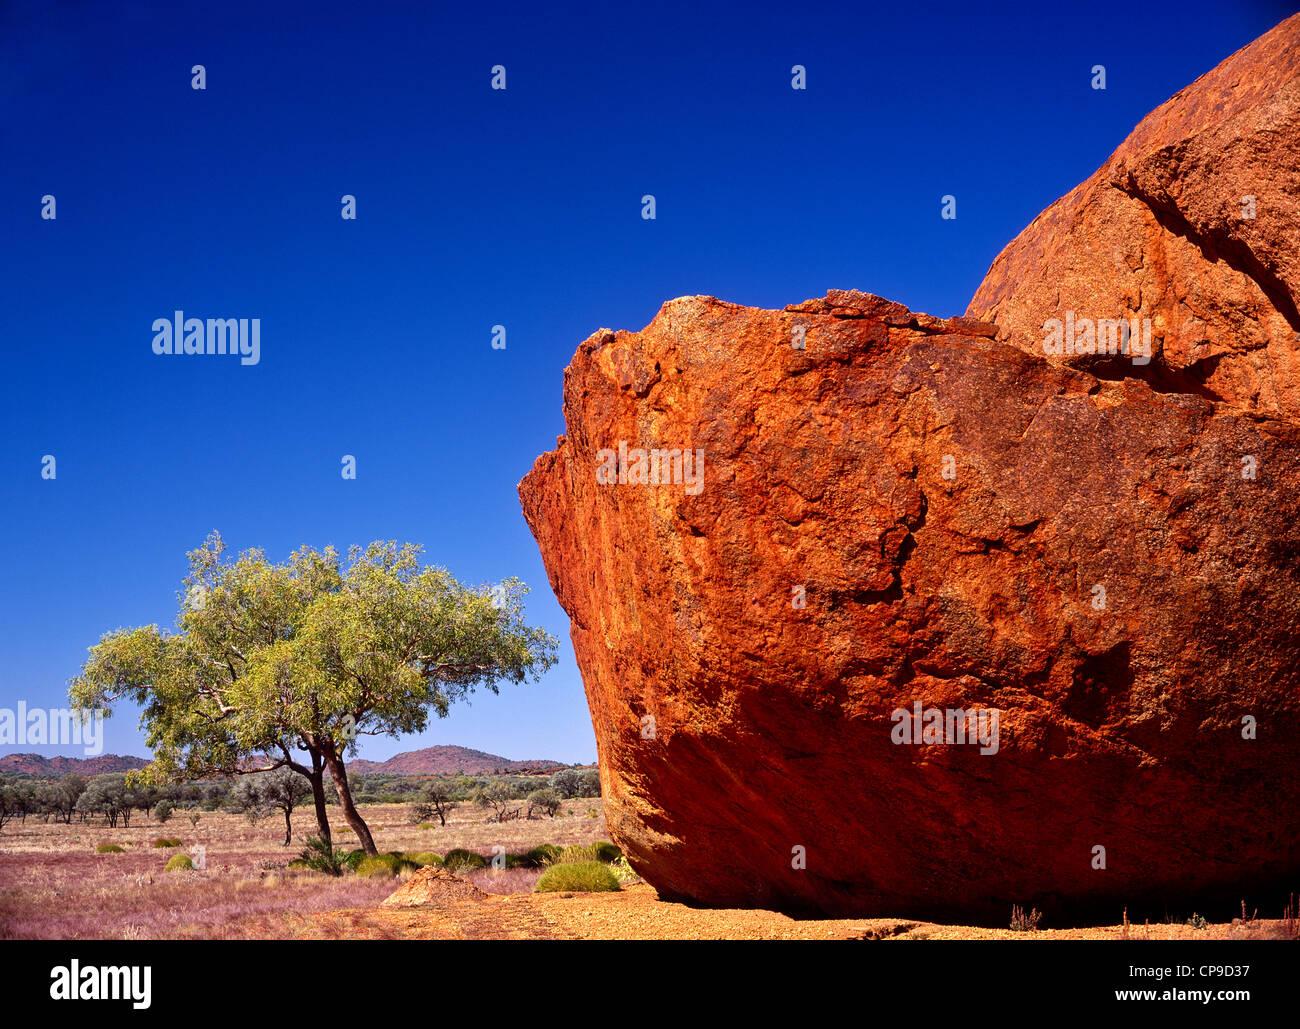 Sandstone boulder, Mann Ranges, Sth Australia - Stock Image